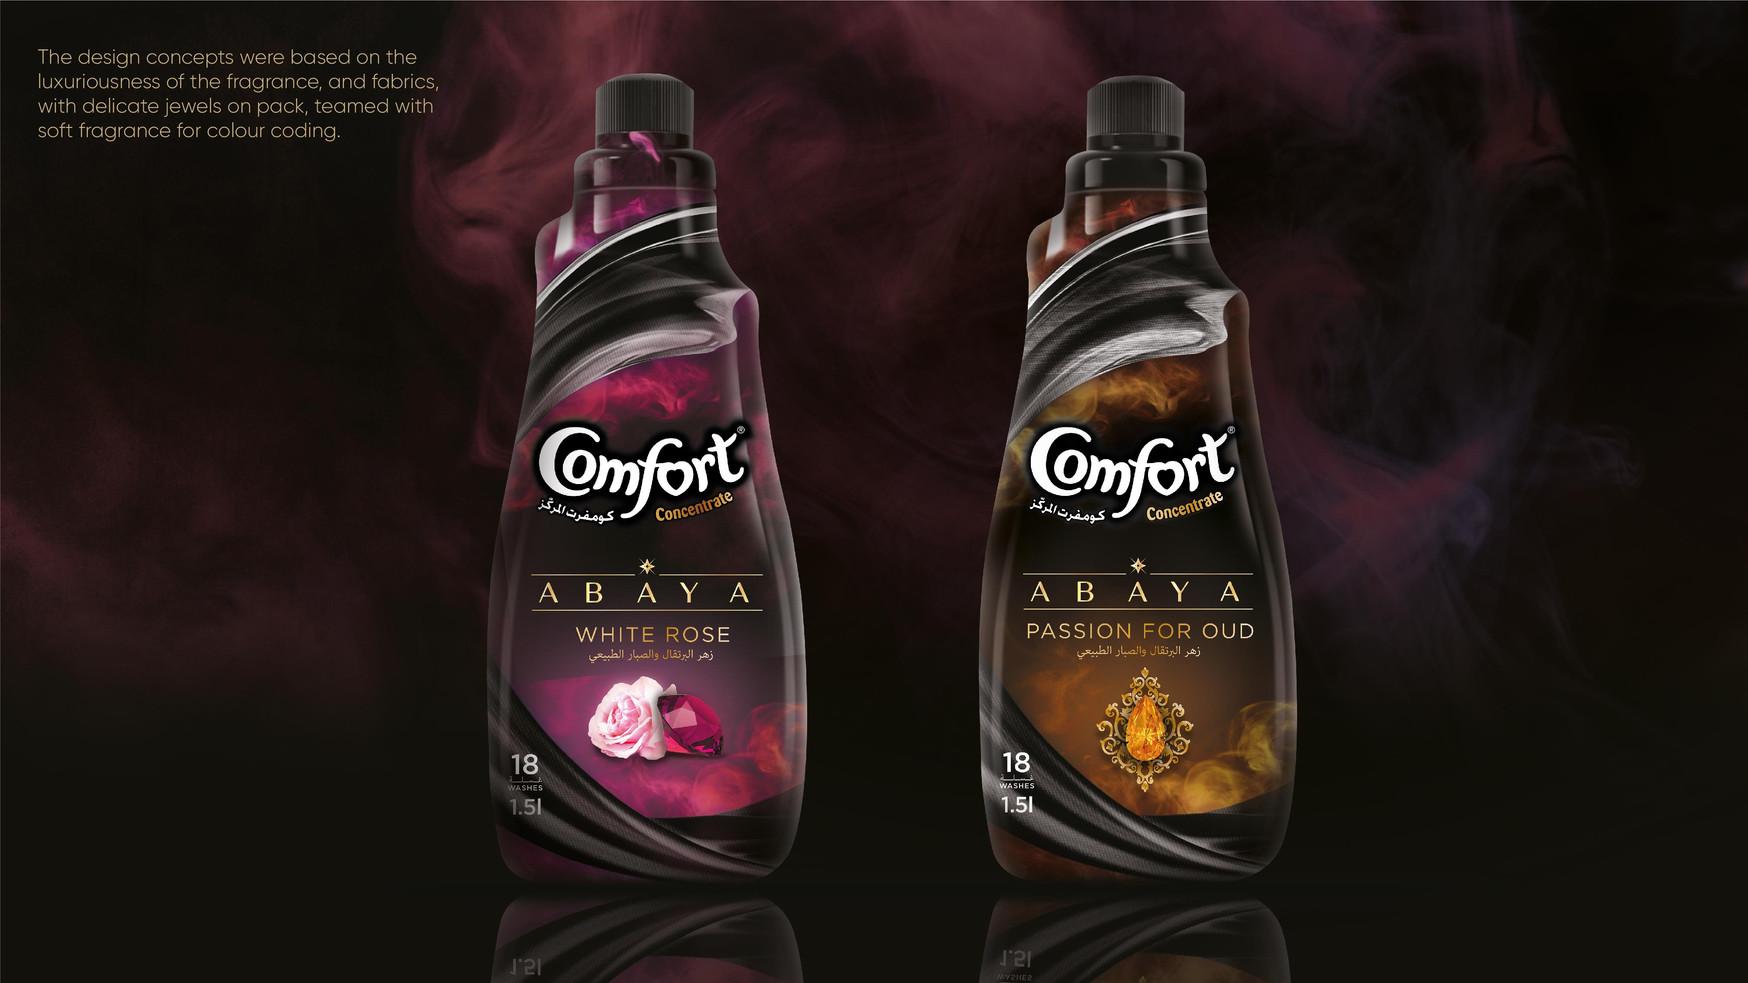 Comfort Abaya